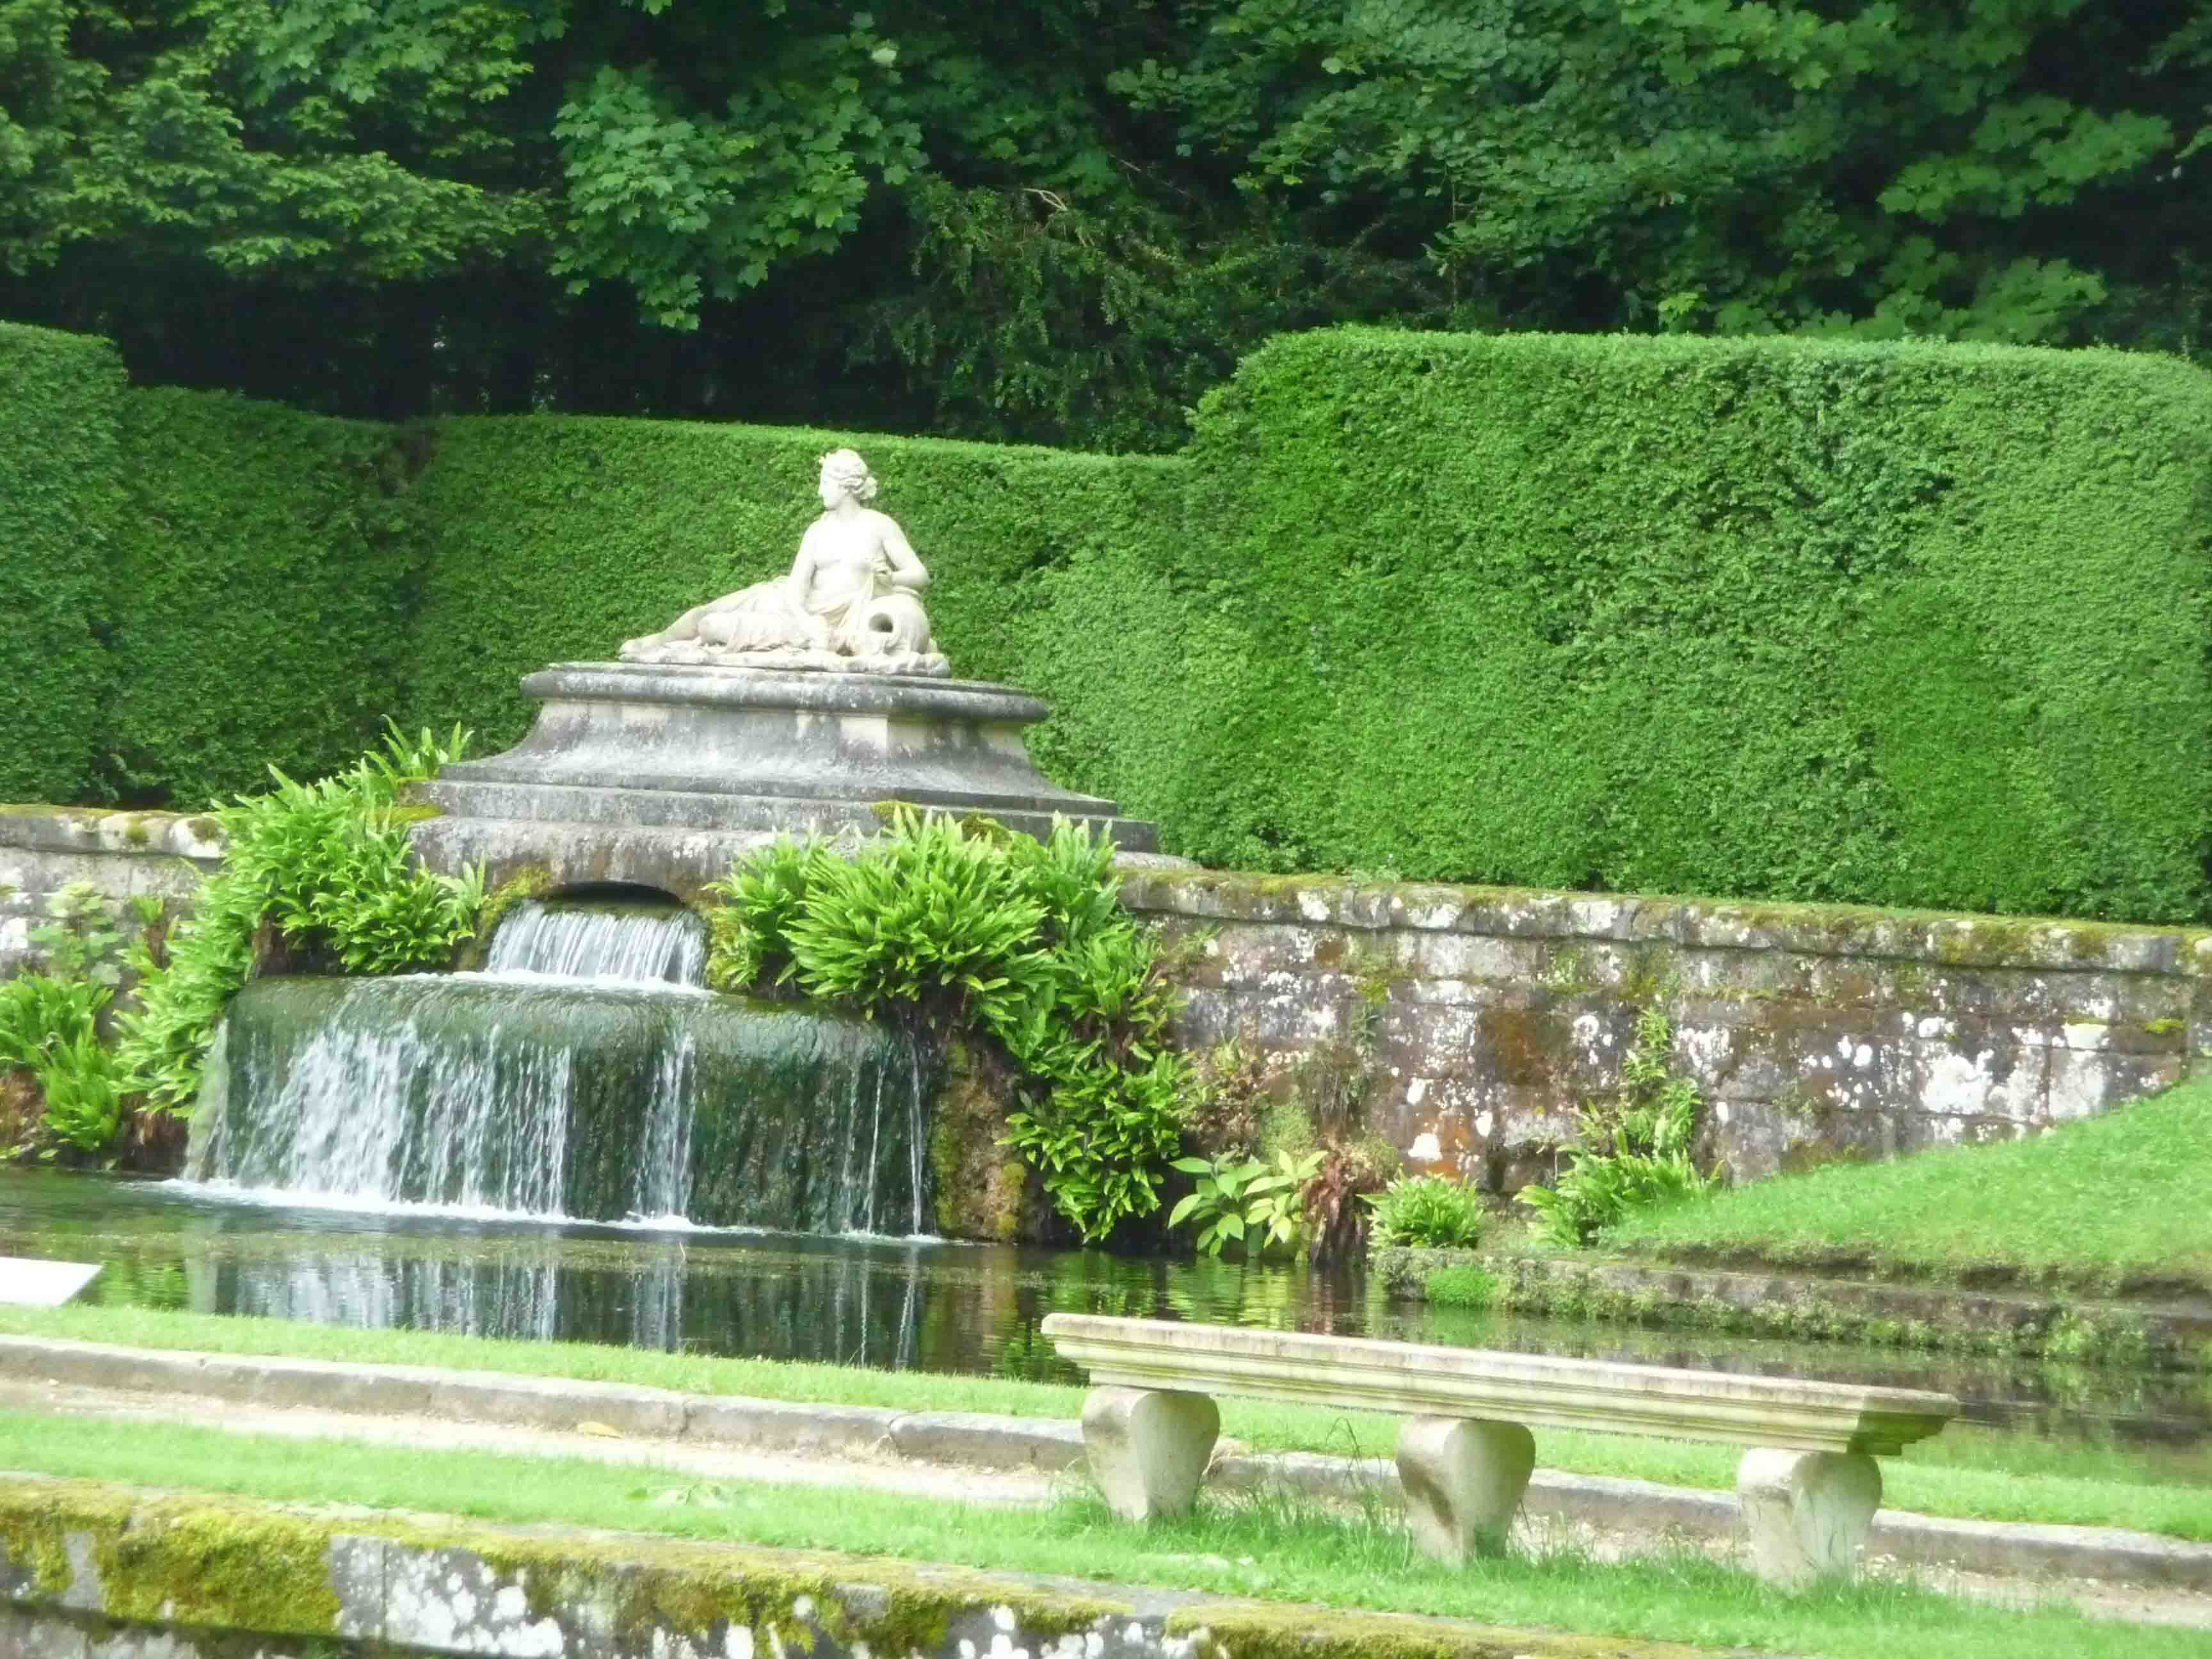 Belle vive le jardin bernay sabakunohana for Vive le jardin montaigu